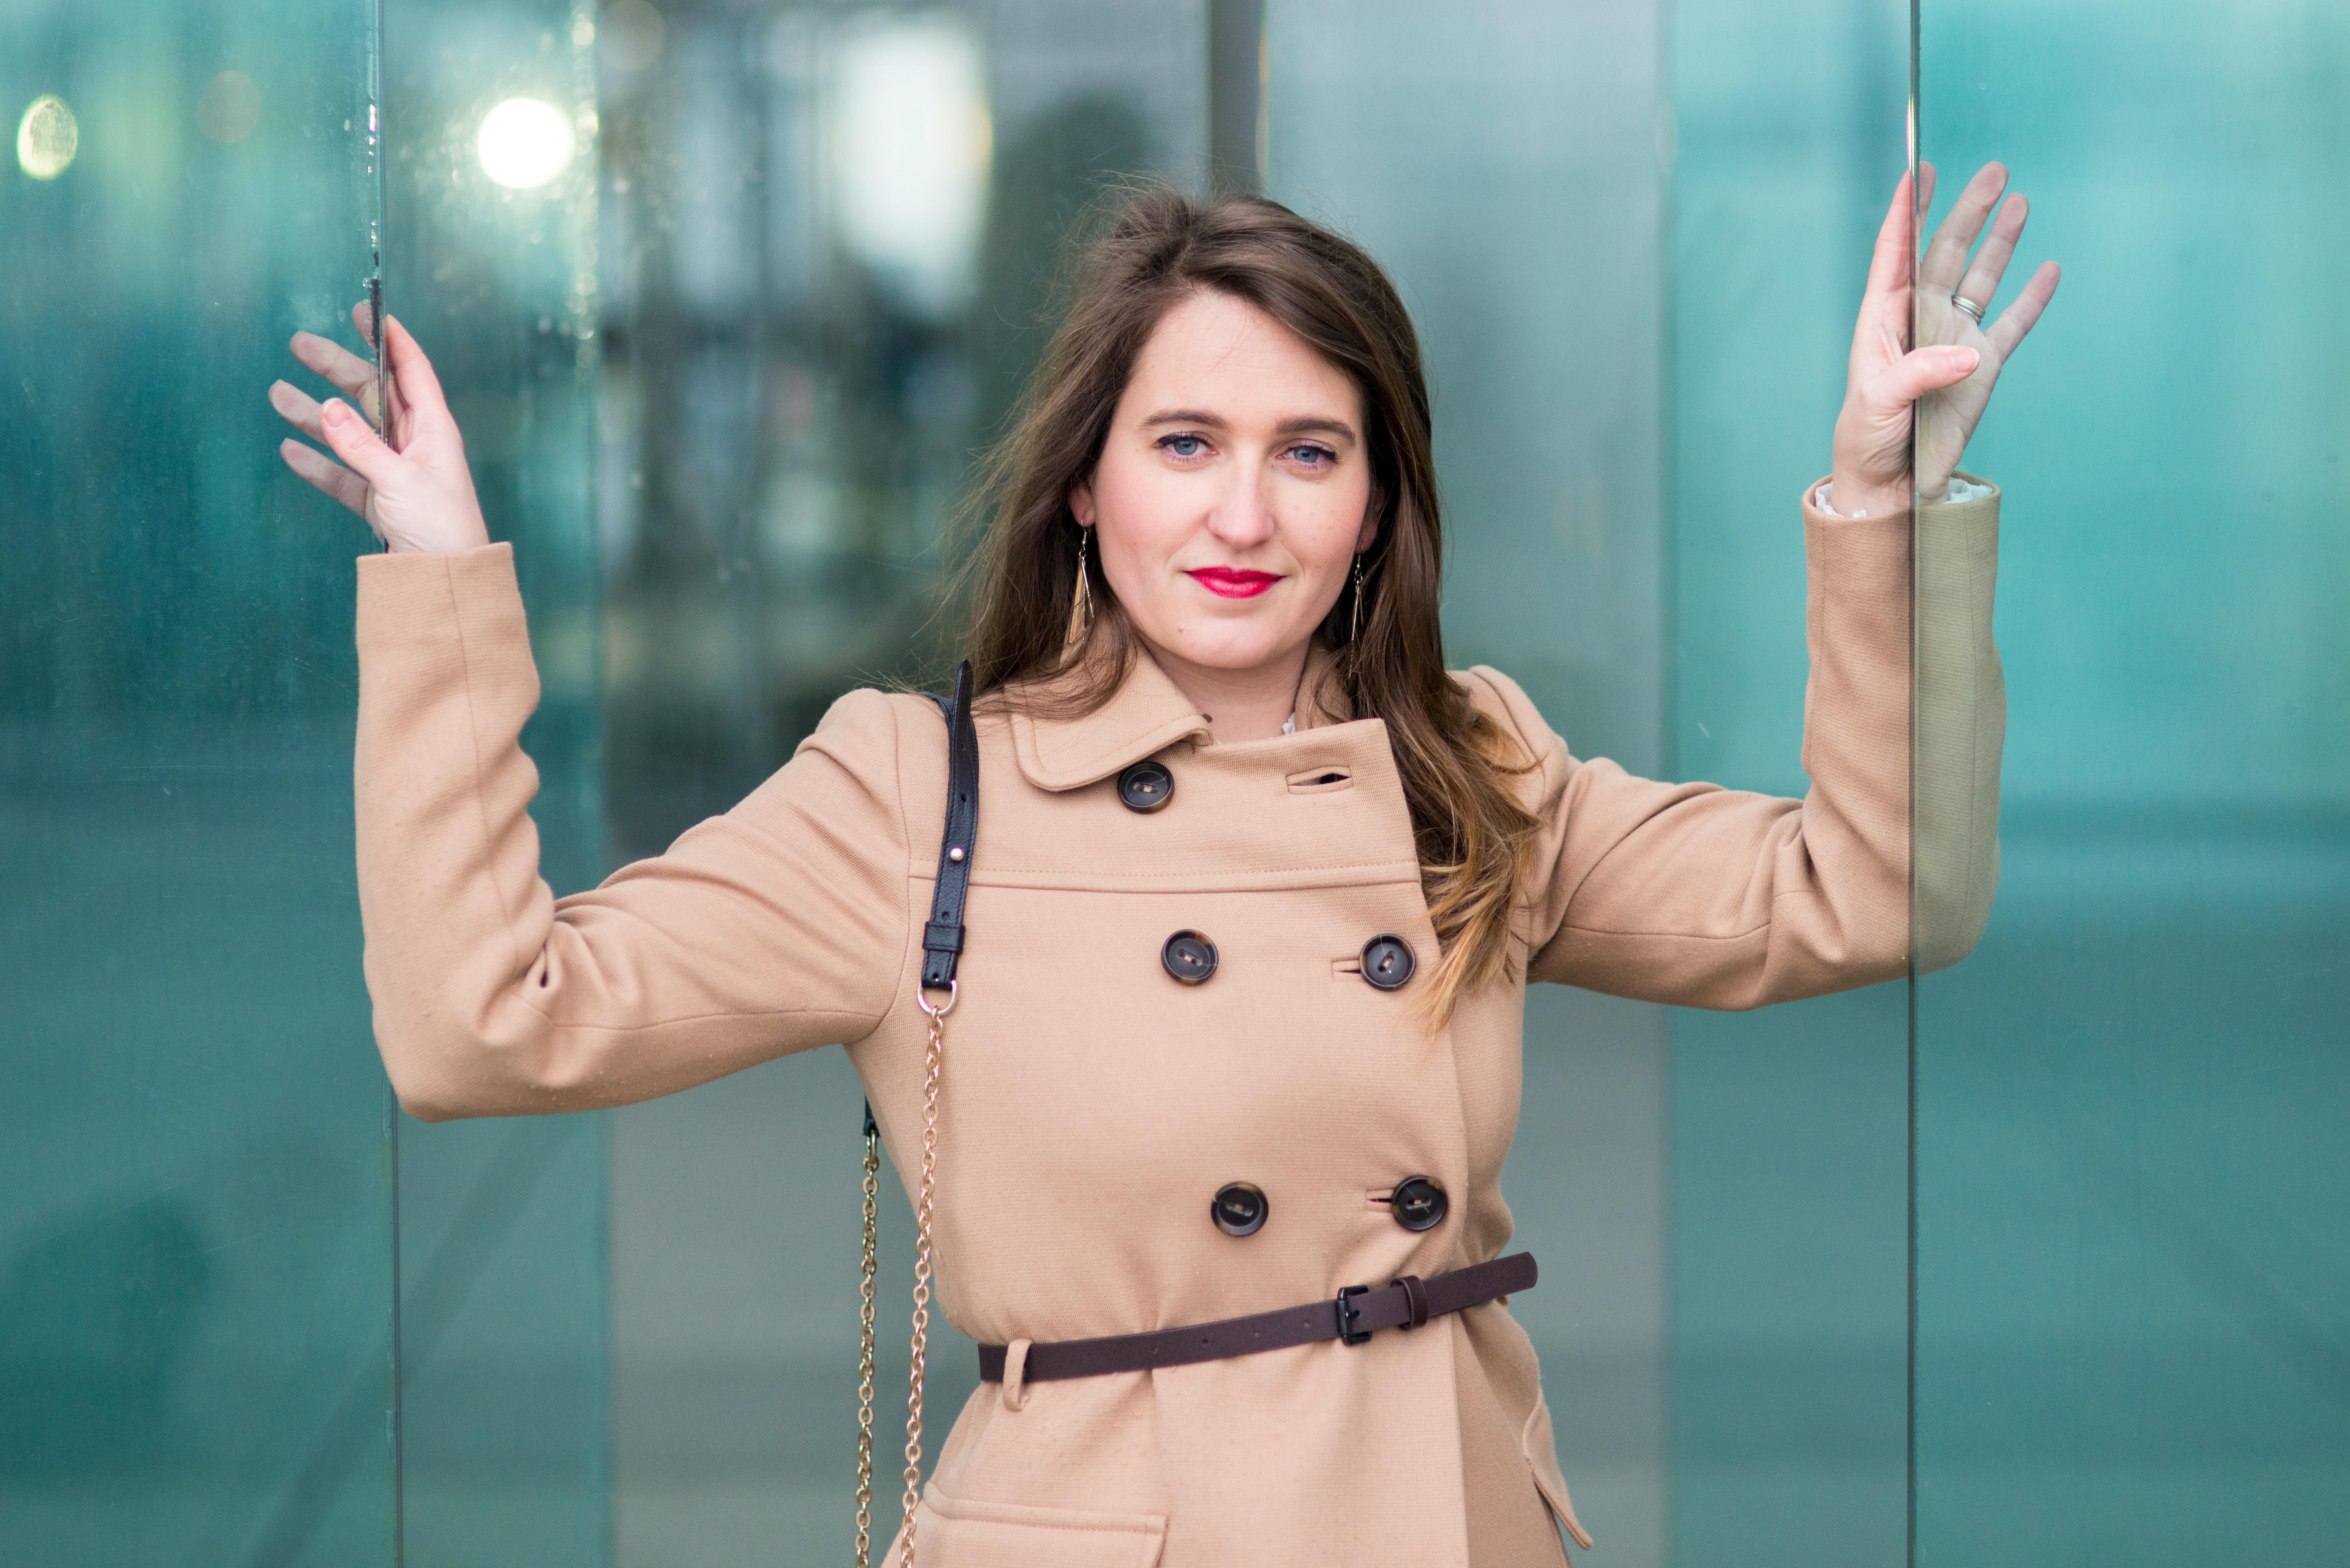 style-sophistique-modele-grandearche-ladefense-paris-fashionblogger-influencer-blouse-zara-seralynepointcom-ump_6666